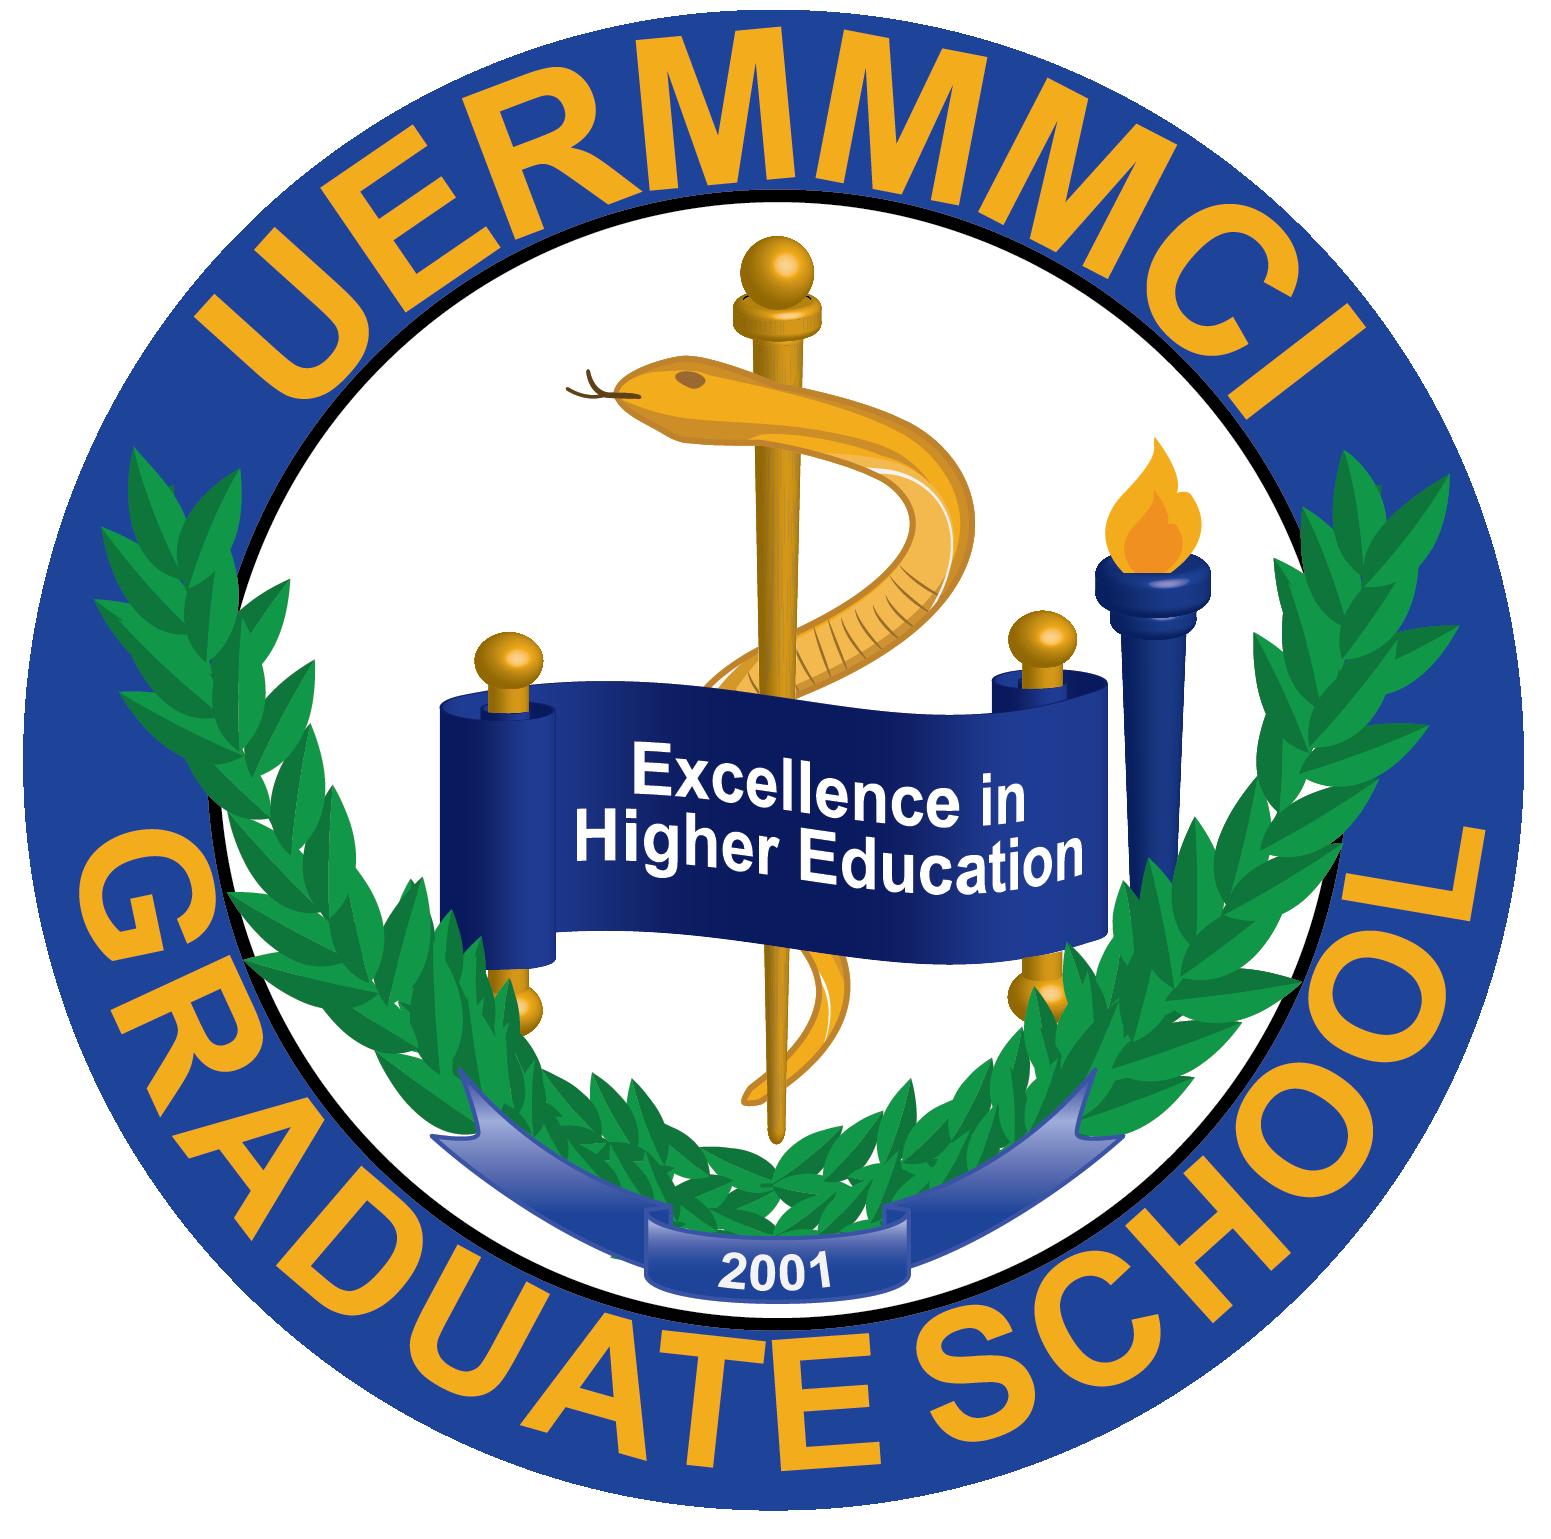 Uermmmc aboutus graduate school. Torch clipart education